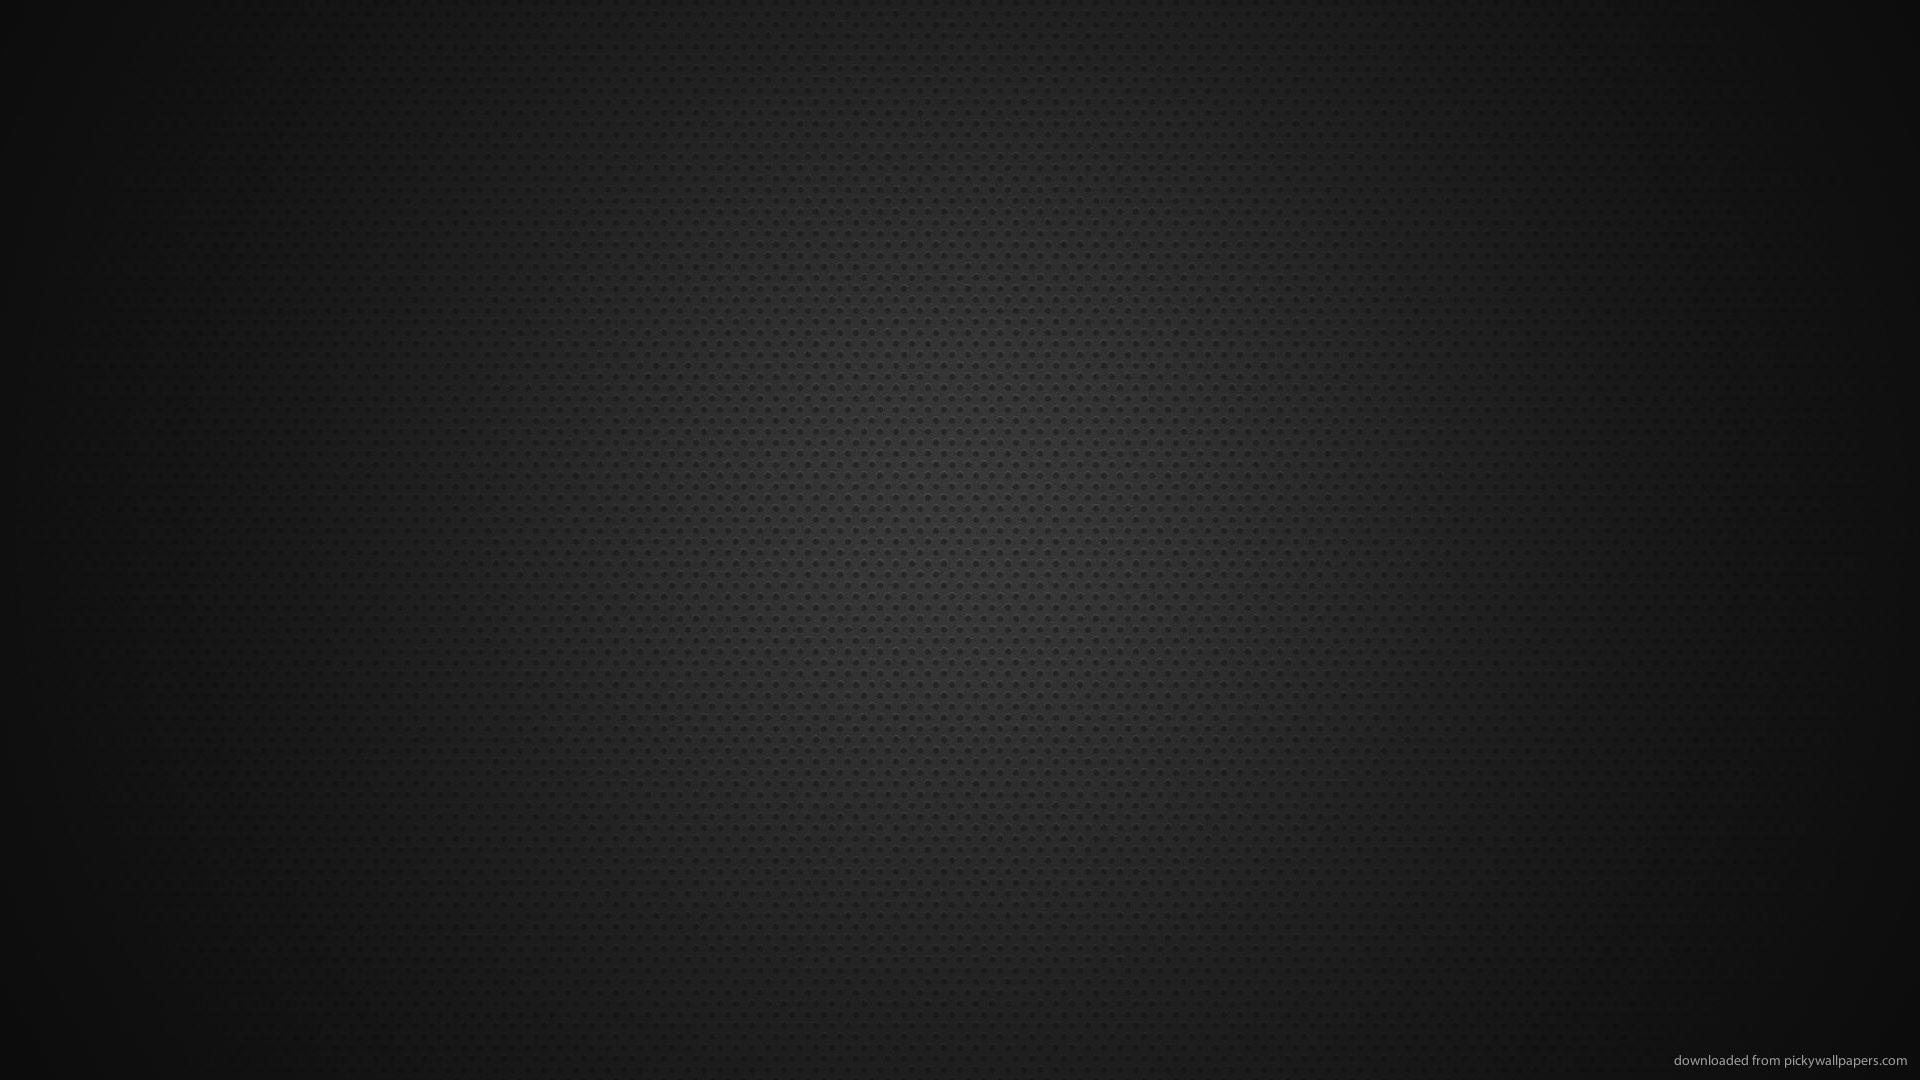 1366x768 Simple Dark 1 Wallpaper